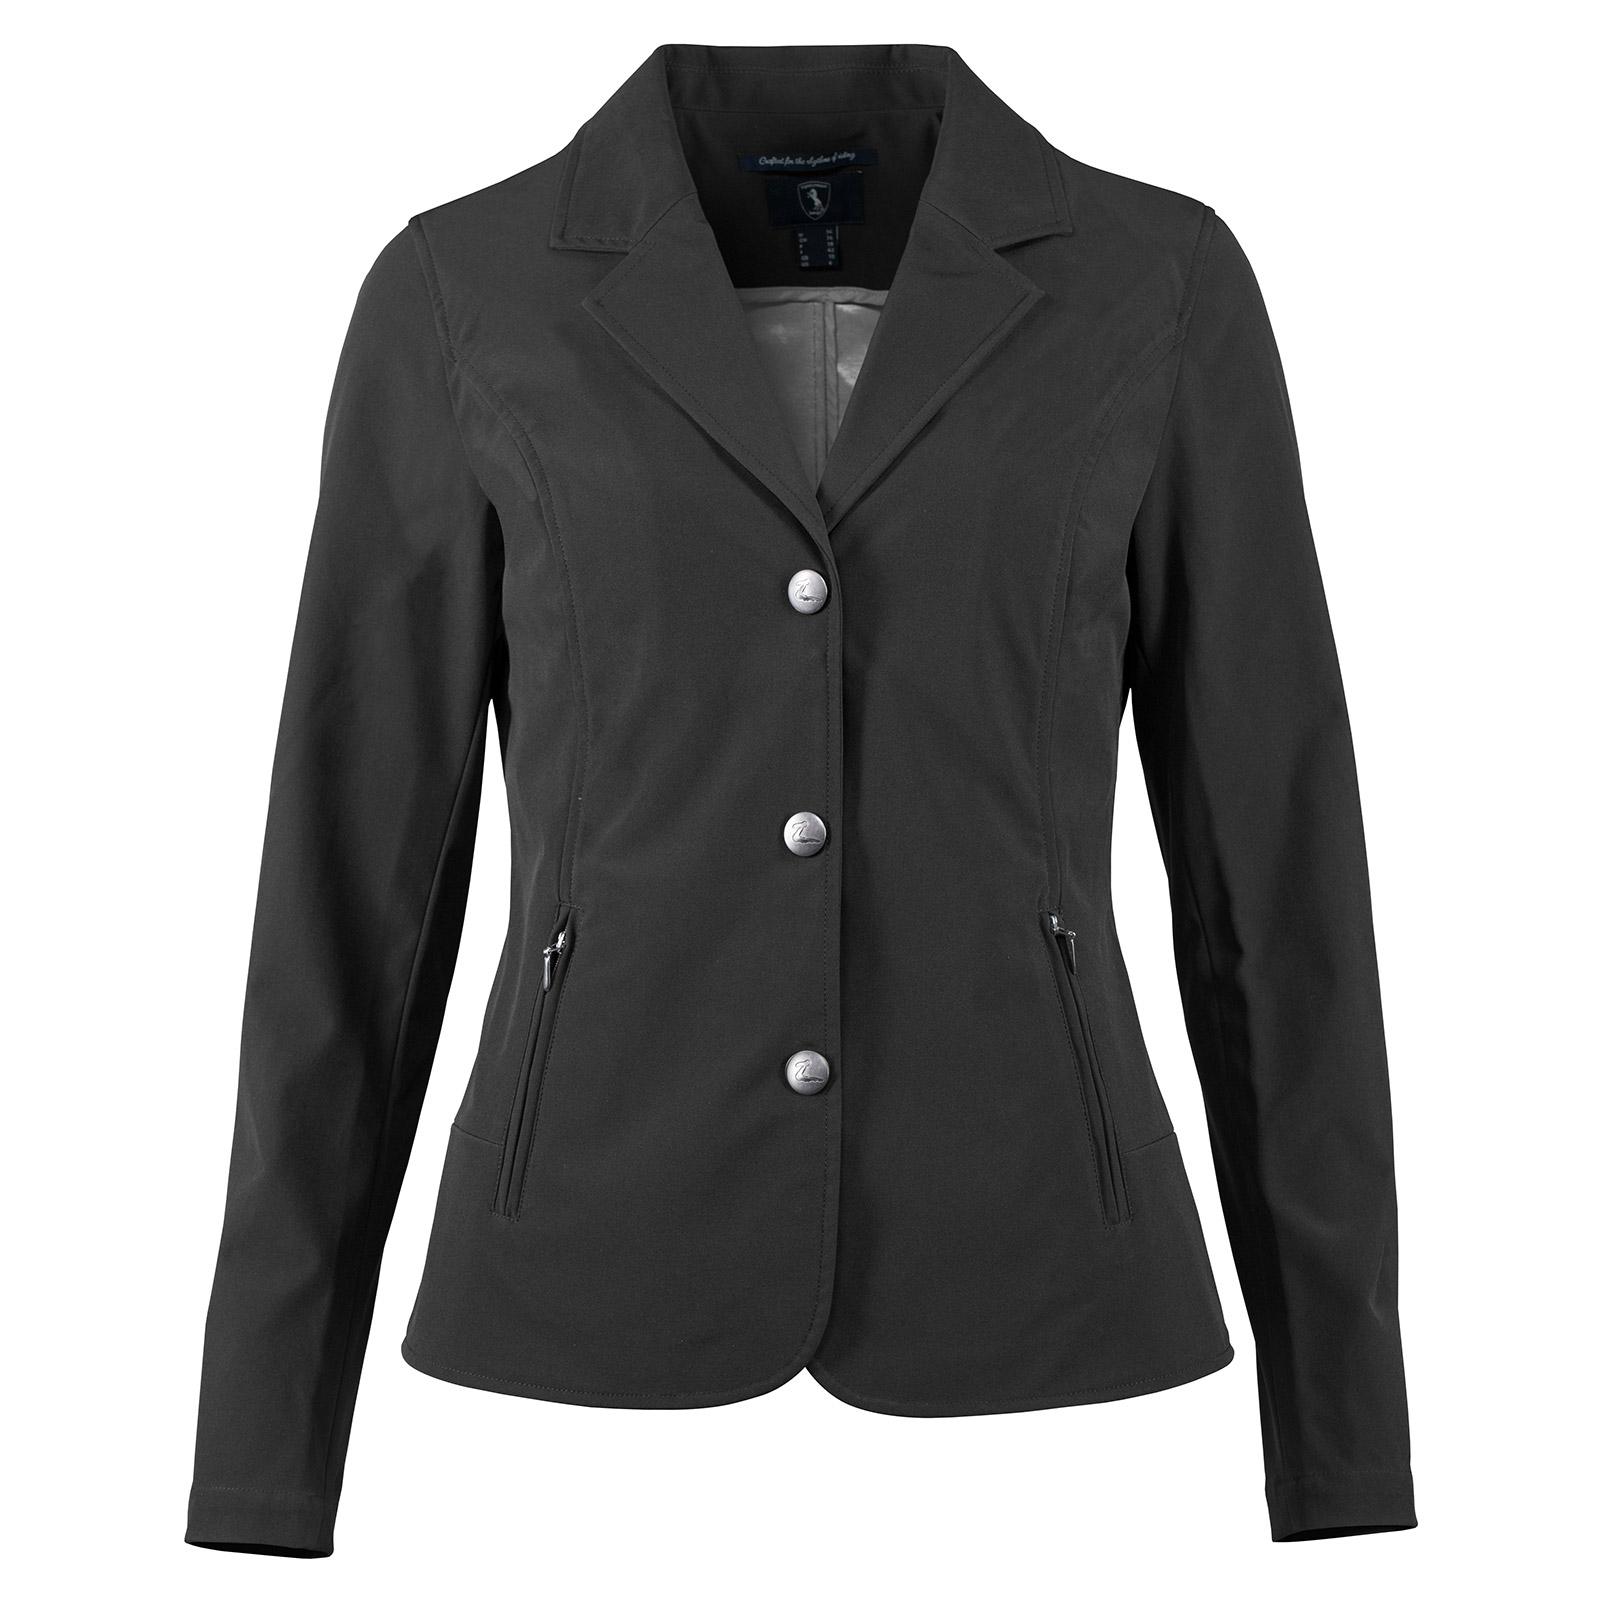 Buy Horze Adele Women's Softshell Show Jacket   horze.eu